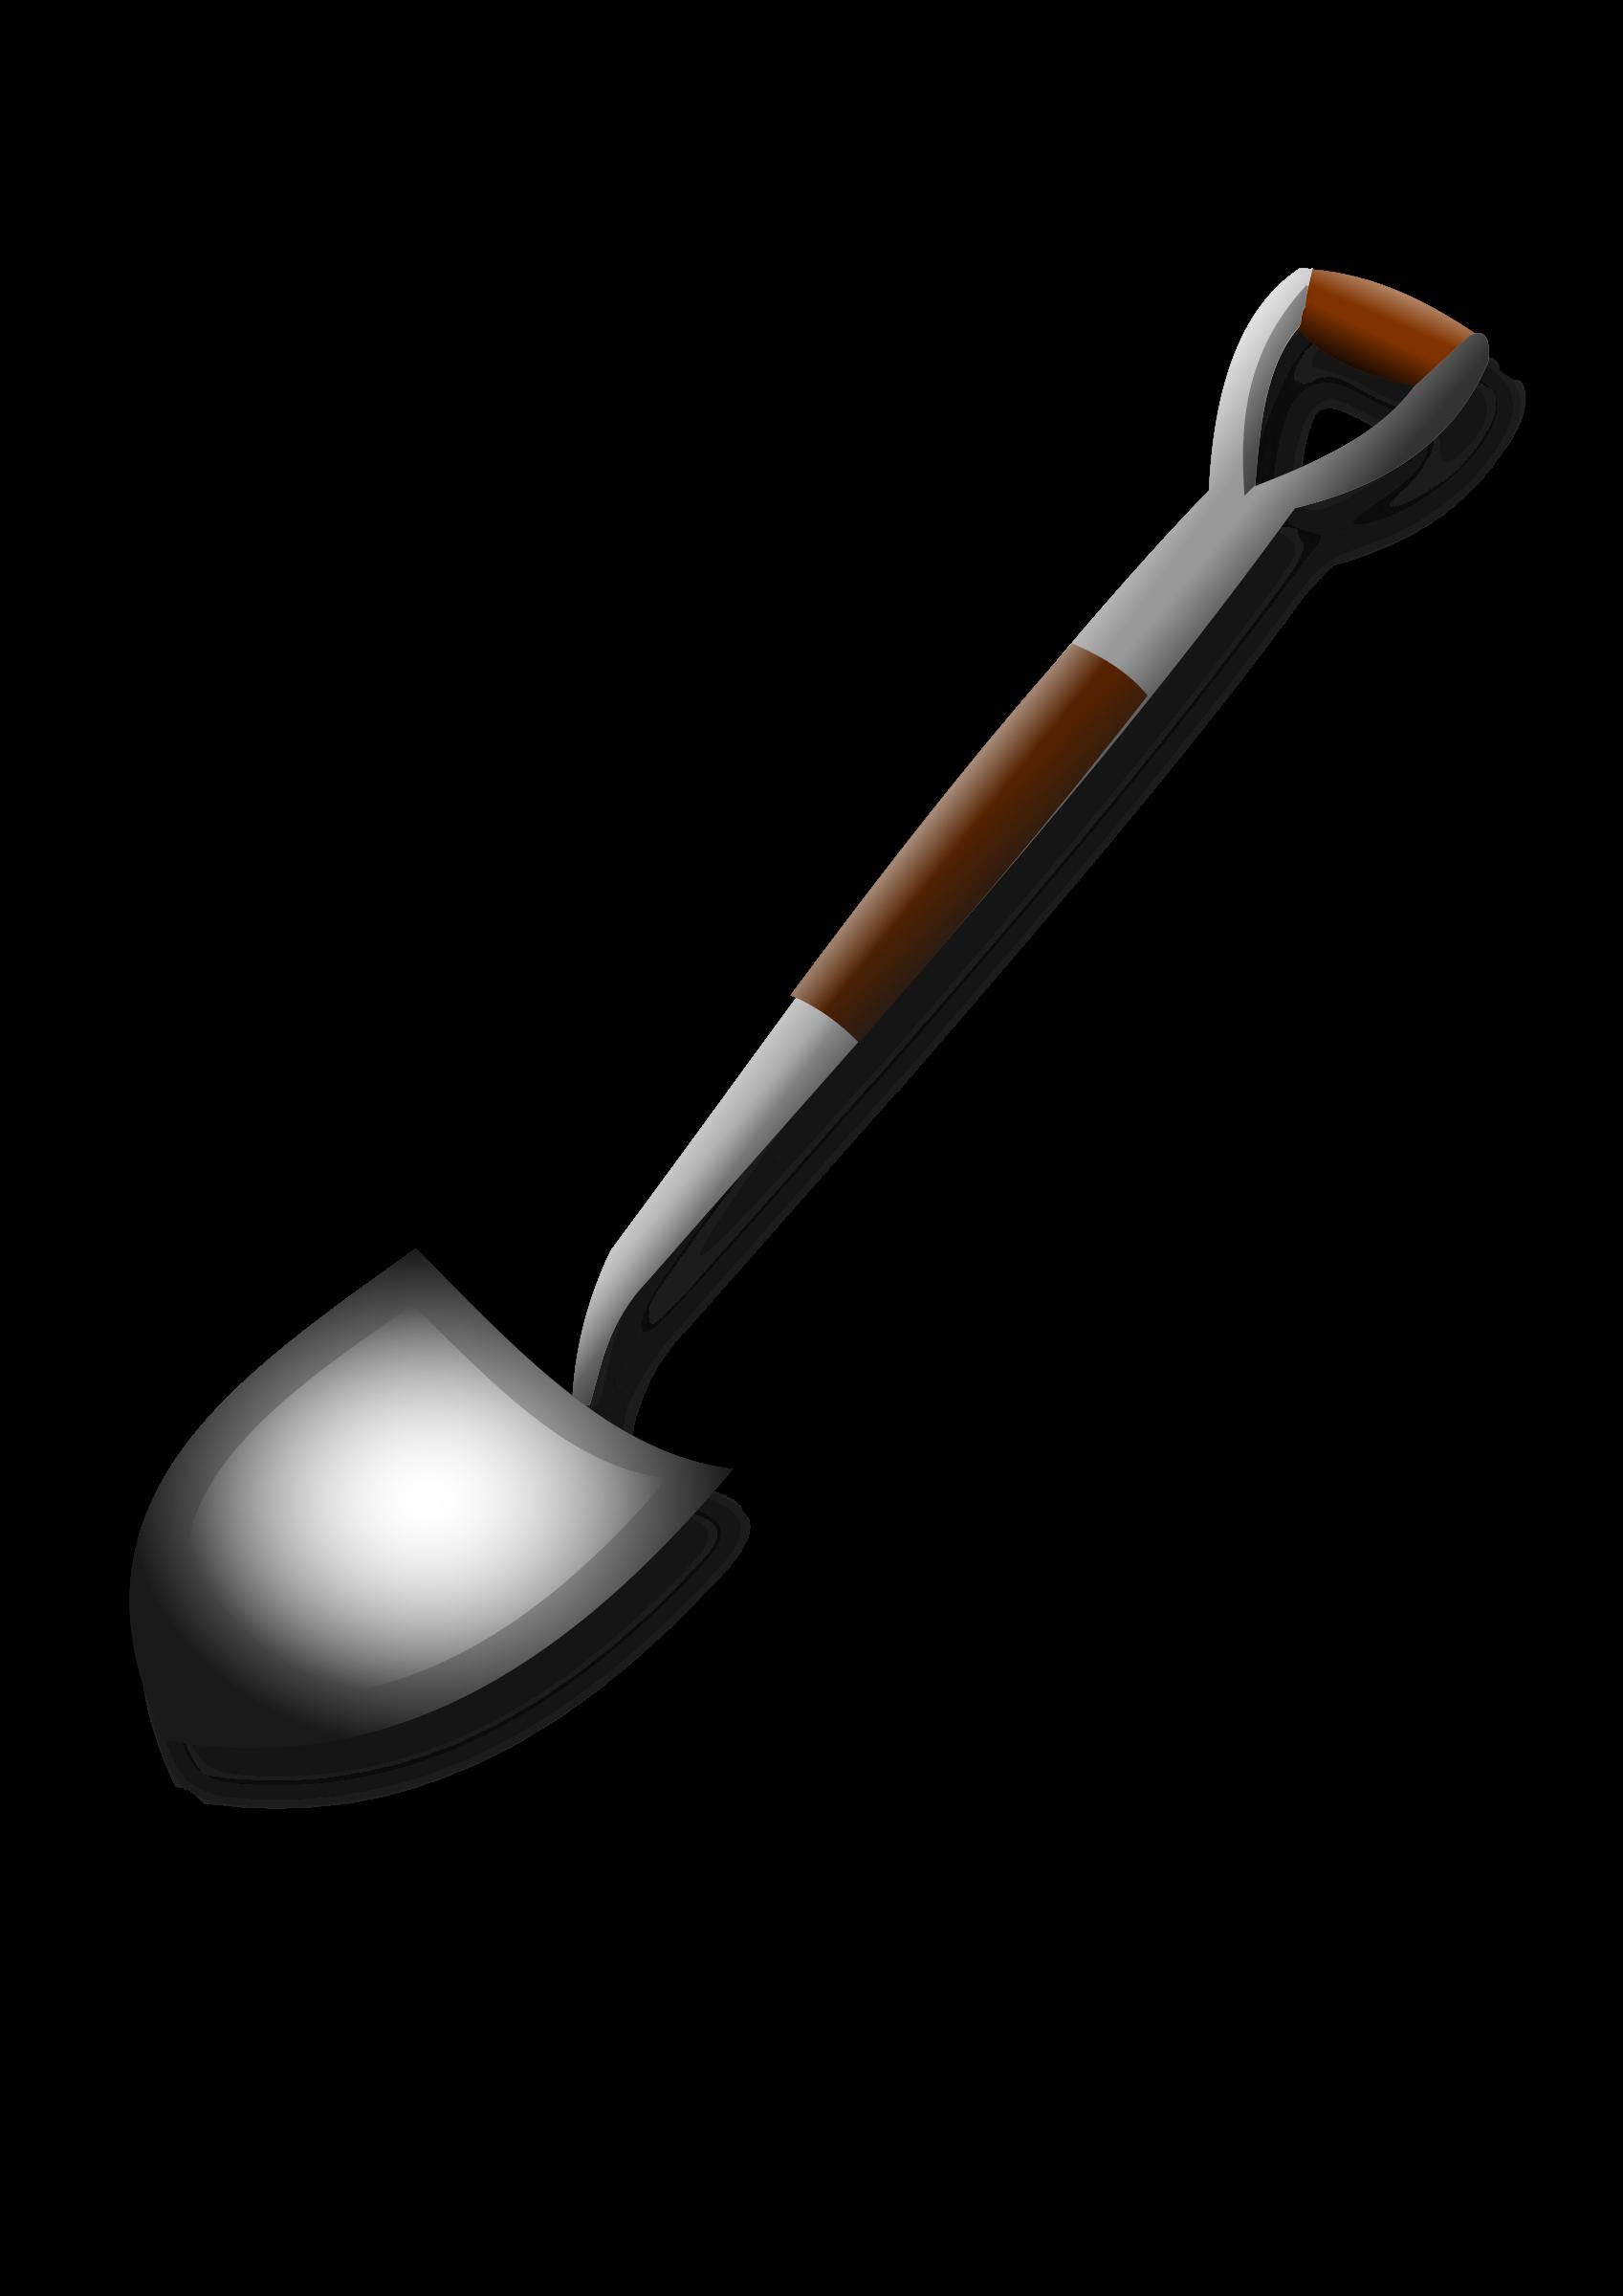 Farmer clipart shovel.  collection of transparent